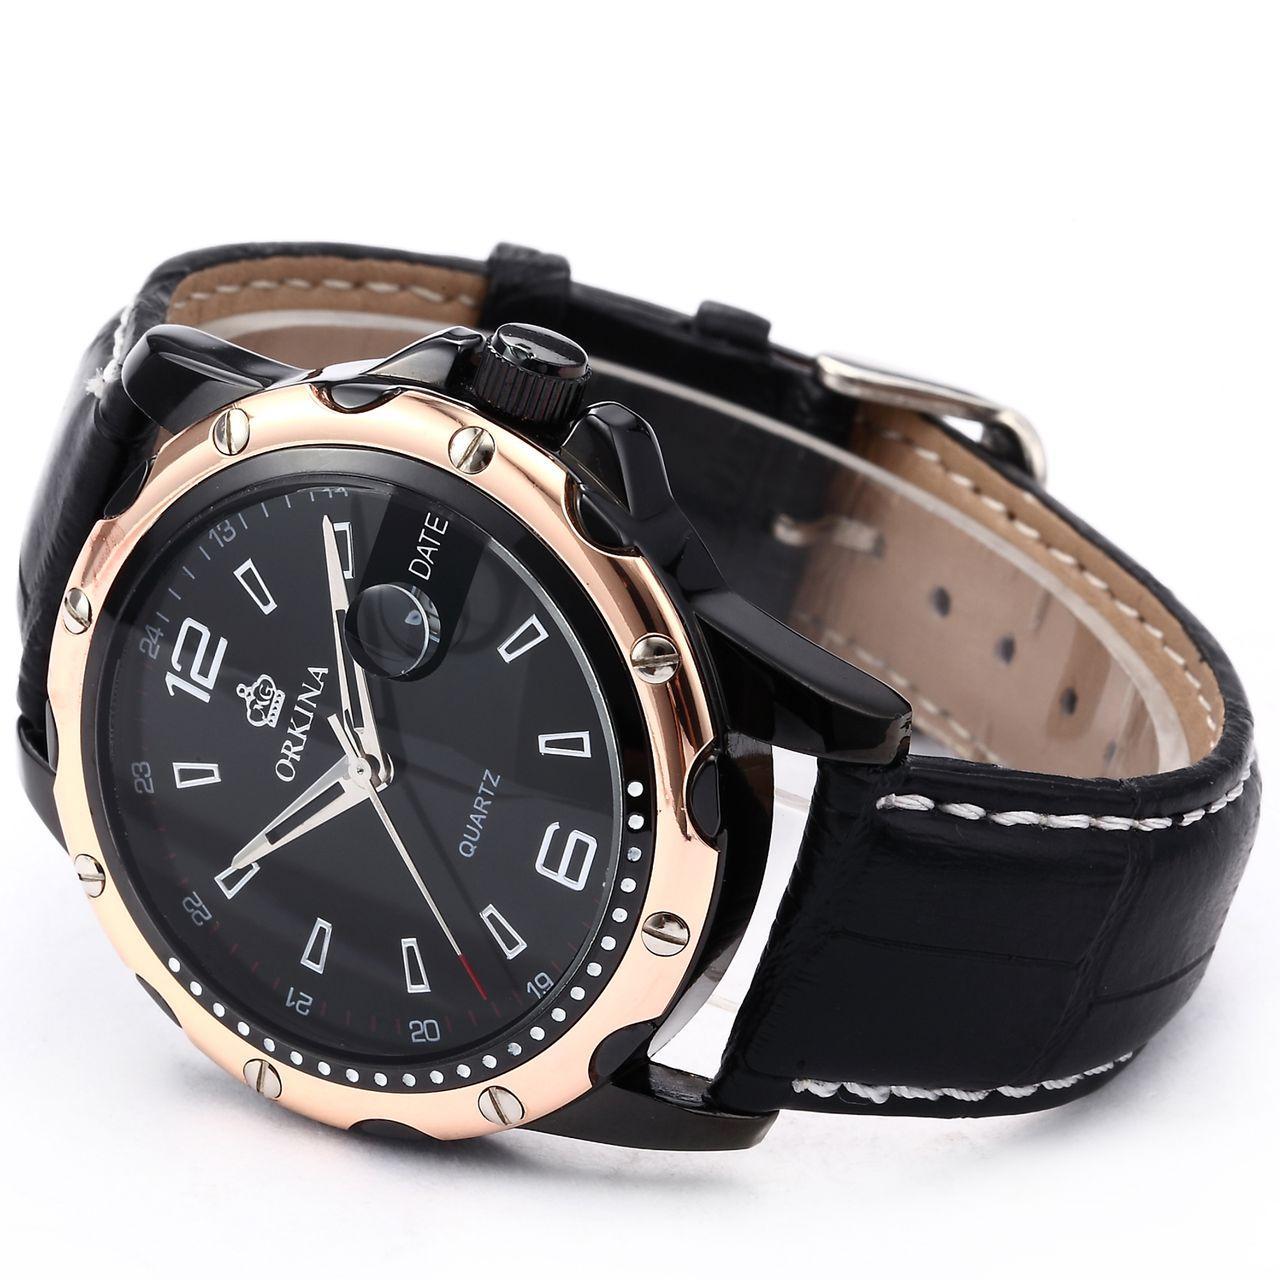 ORKINA Luxury Date Calendar Display Leather Men Wrist Quartz Sport Watch